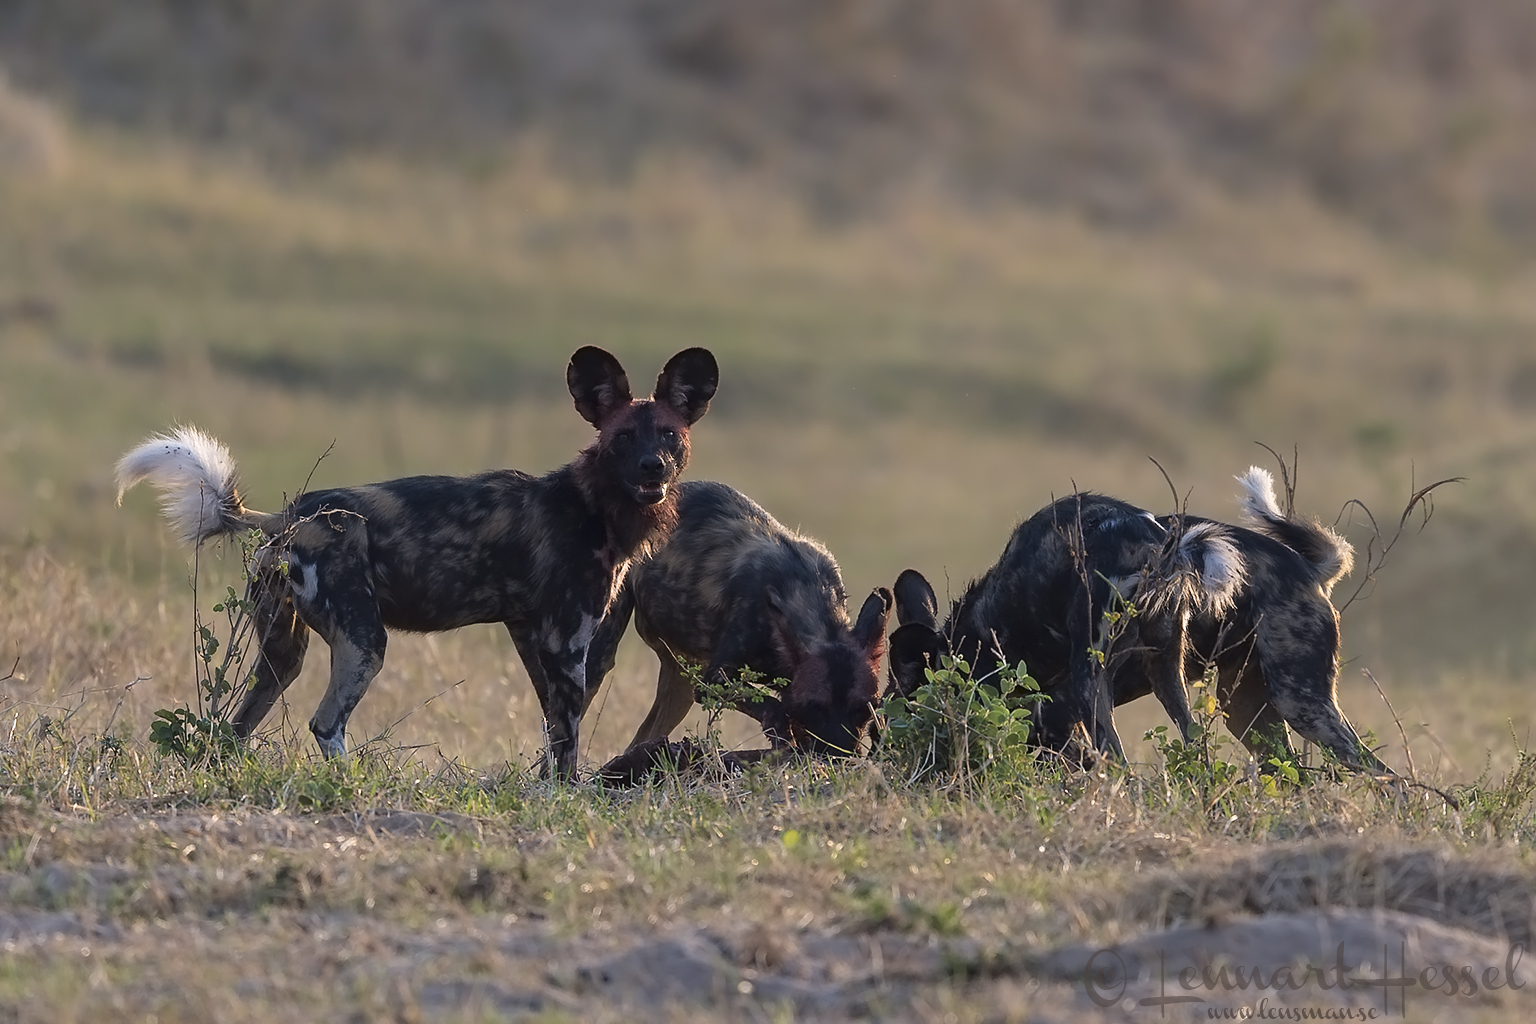 Painted Dogs at kill hunt Mana Pools National Park